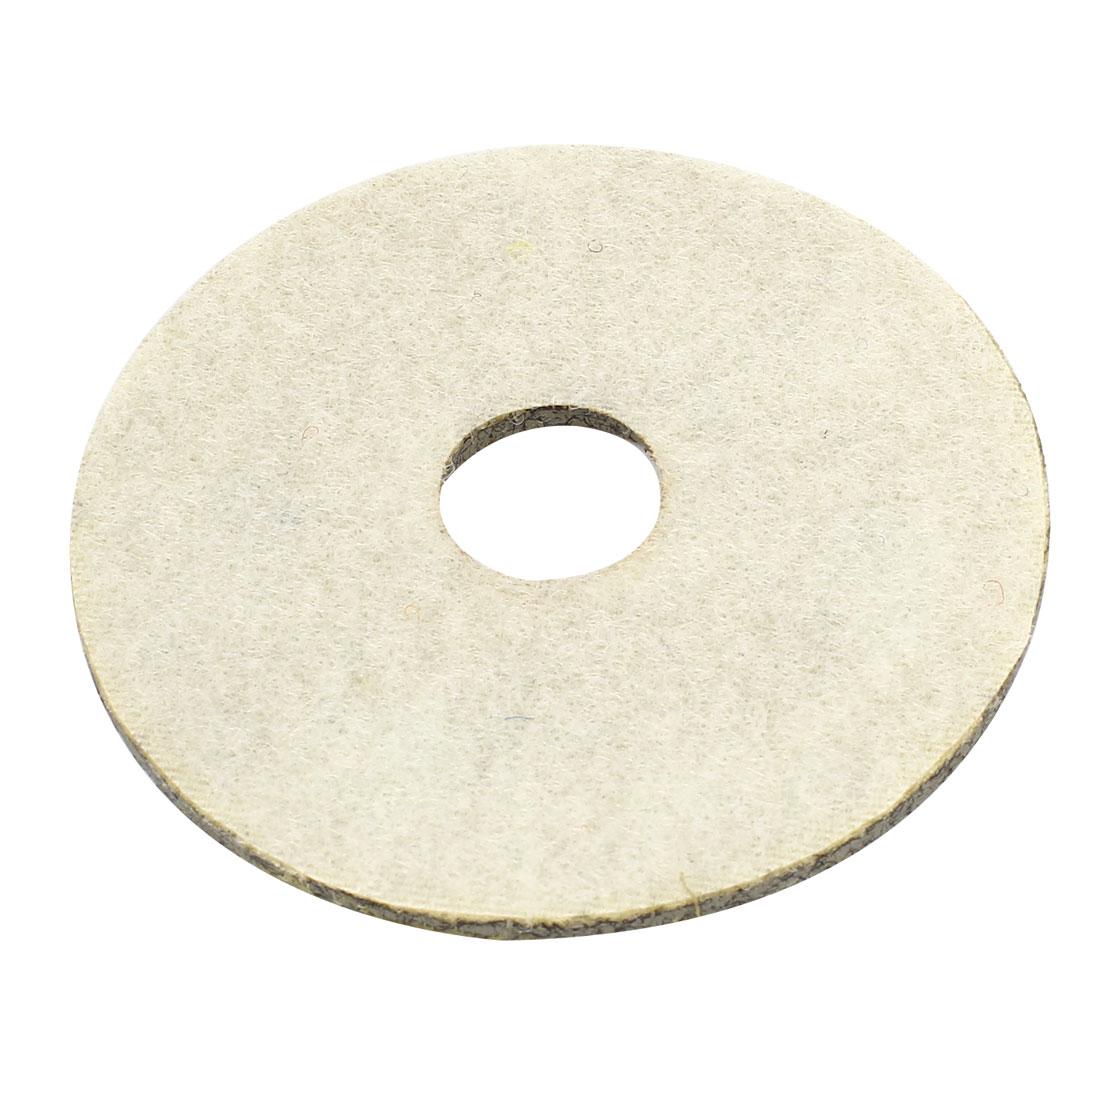 "Grit 50 3"" Dia Tile Stone Polisher Grinder Diamond Polishing Pad White"